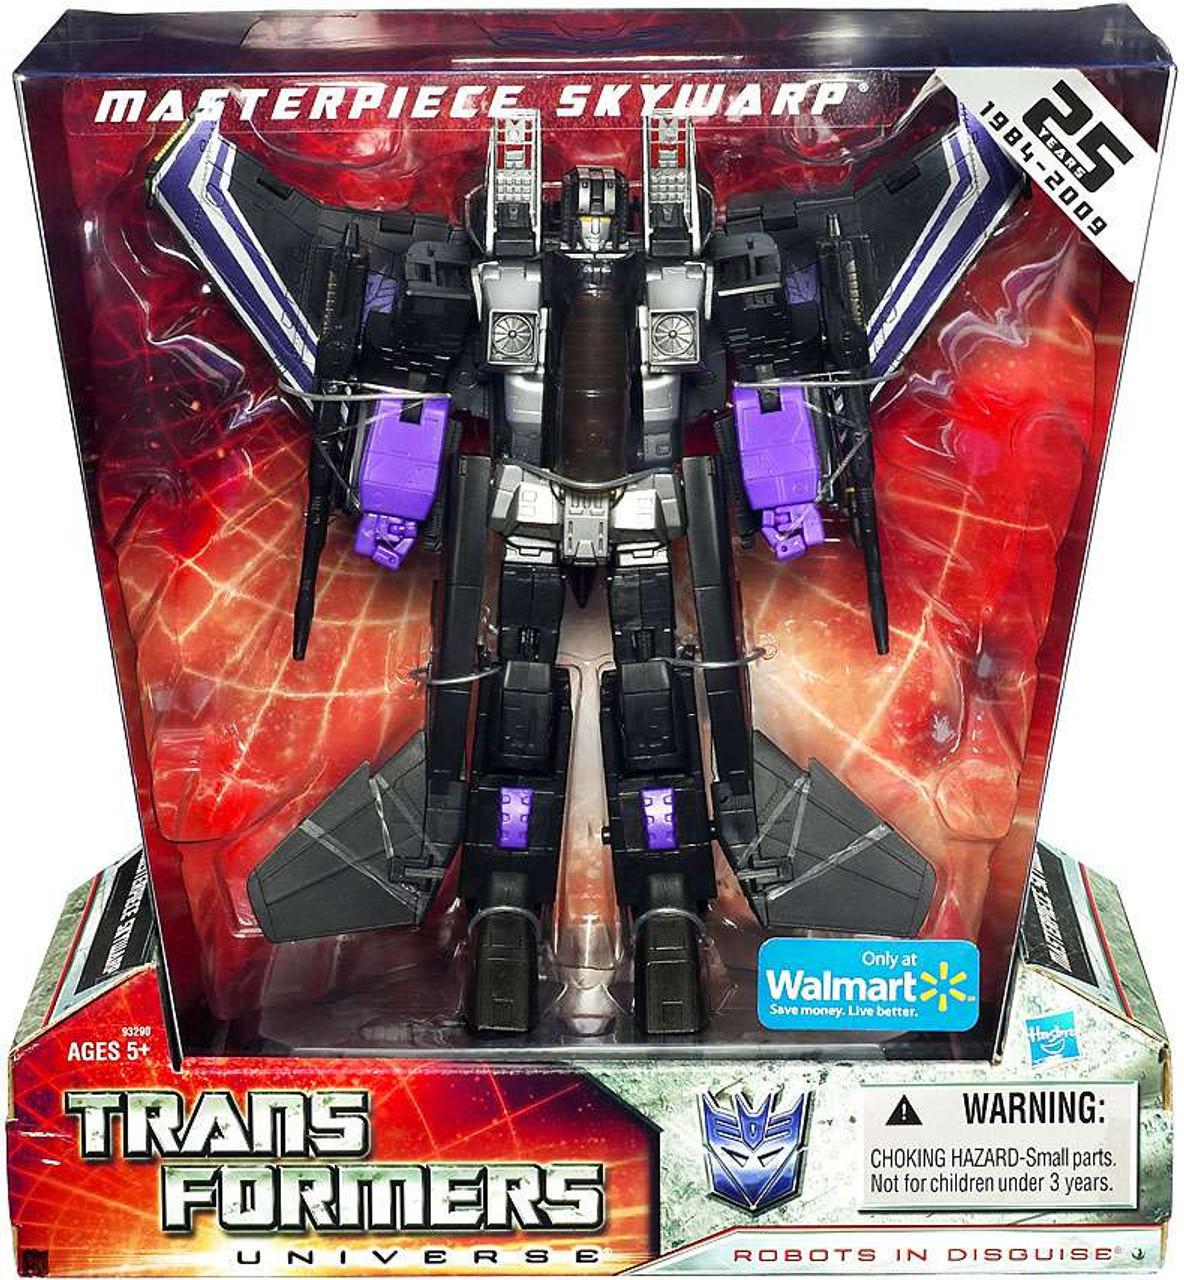 Transformers Universe 25th Anniversary Masterpiece Skywarp Exclusive Deluxe Action Figure